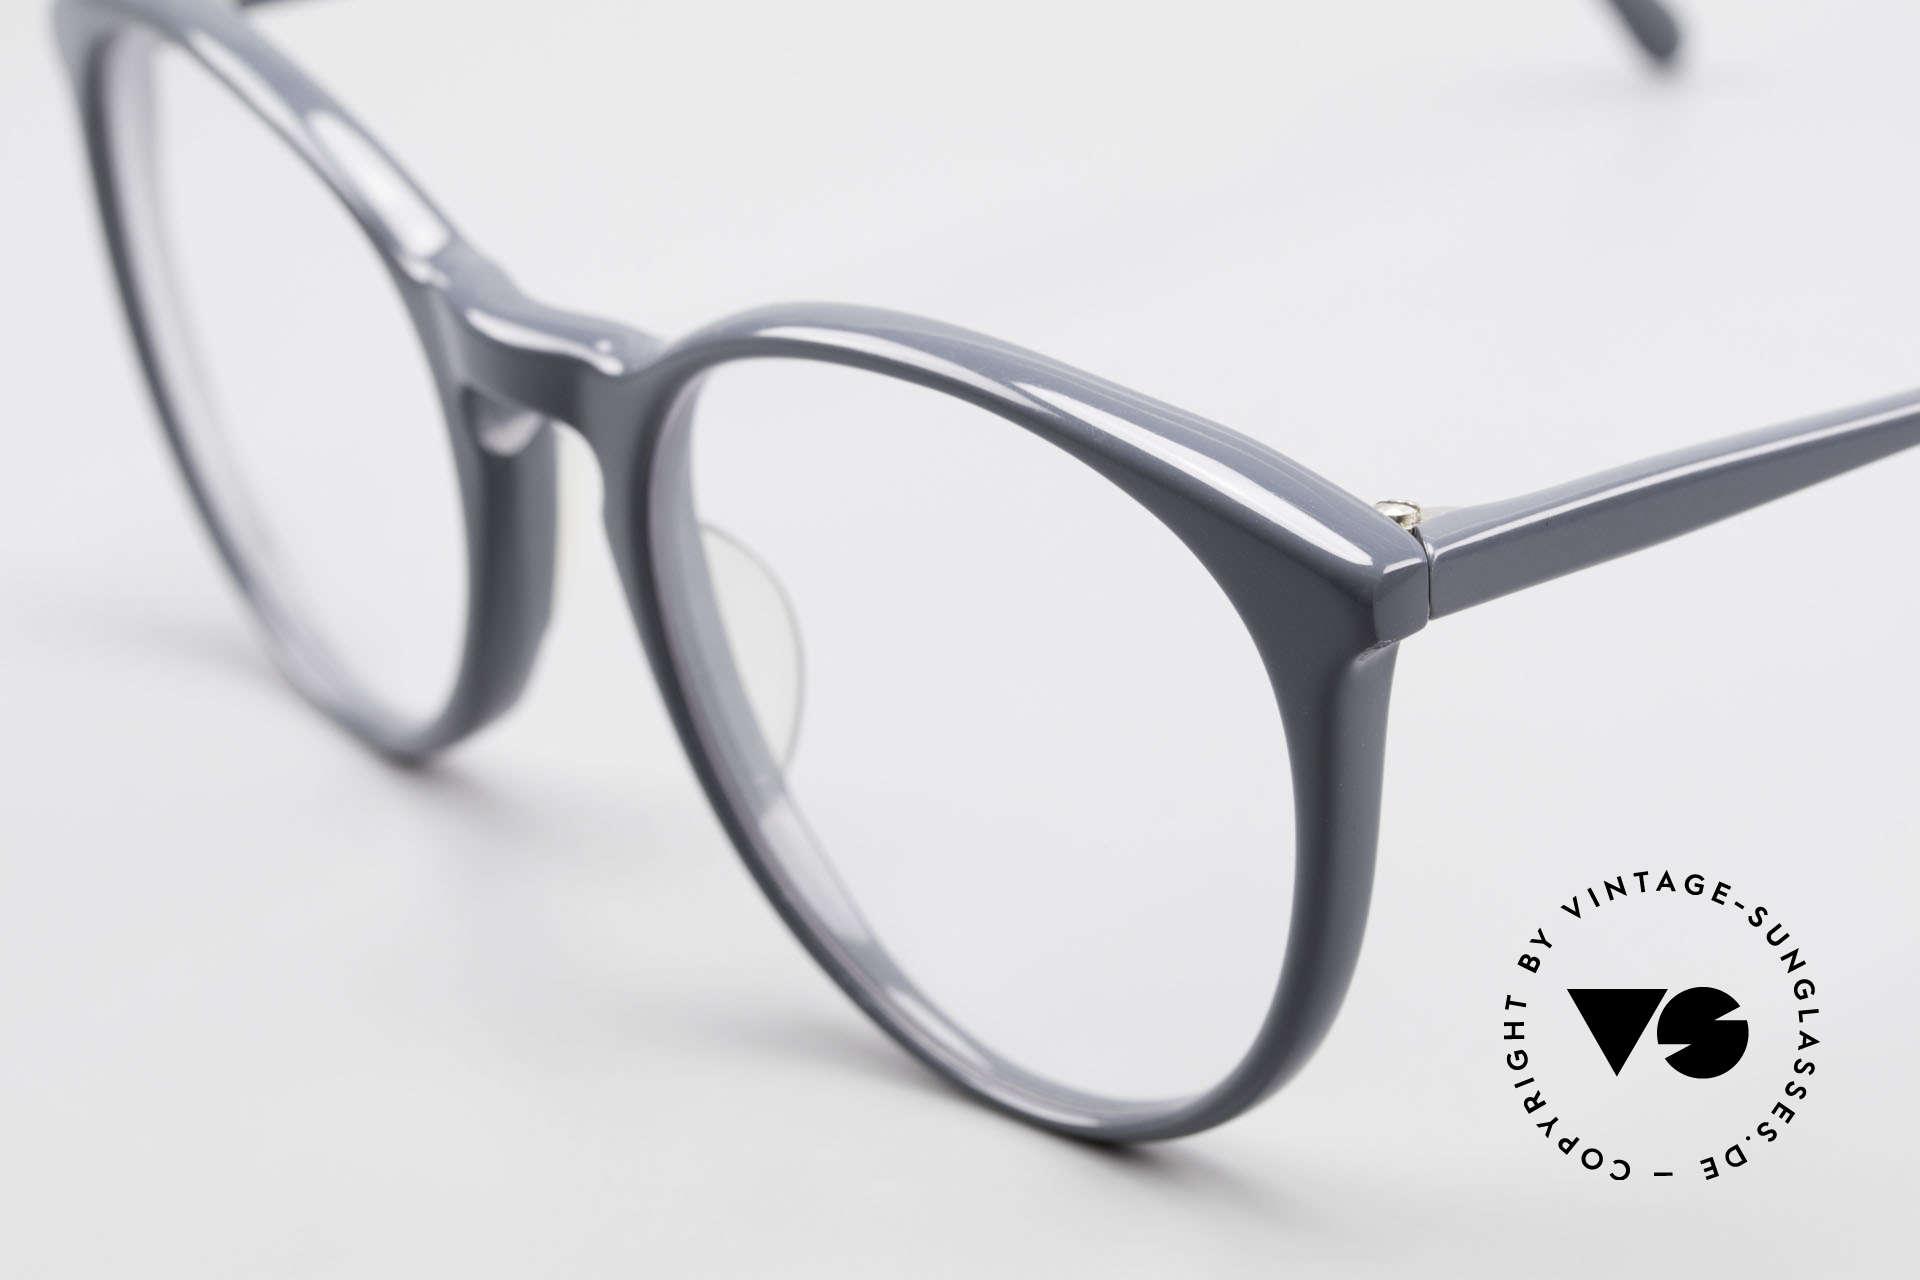 Alain Mikli 901 / 075 No Retro Glasses True Vintage, never worn (like all our vintage Alain Mikli specs), Made for Men and Women